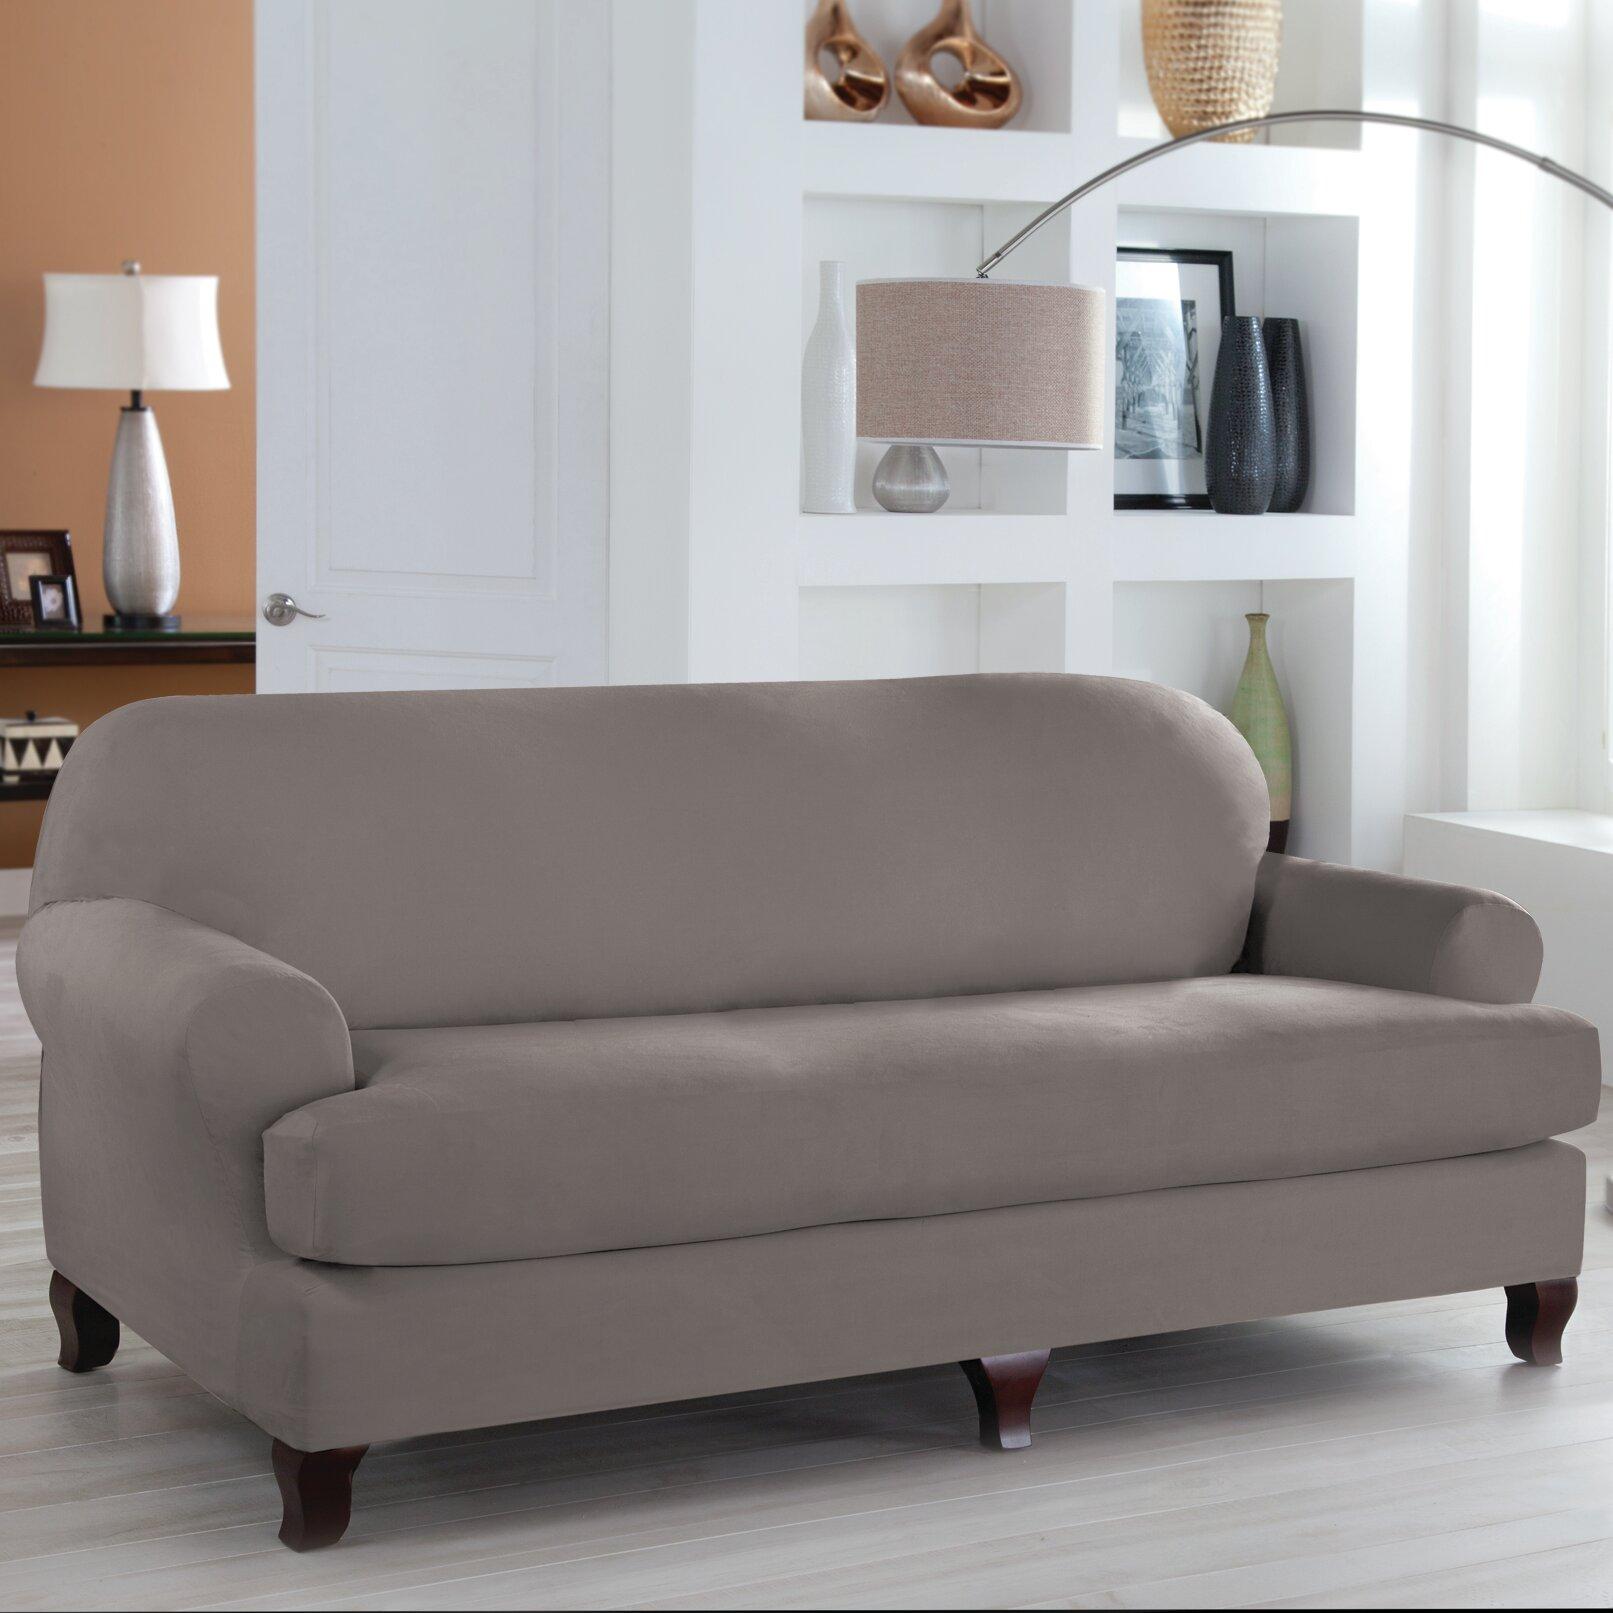 Ordinaire Red Barrel Studio T Cushion Sofa Slipcover U0026 Reviews | Wayfair